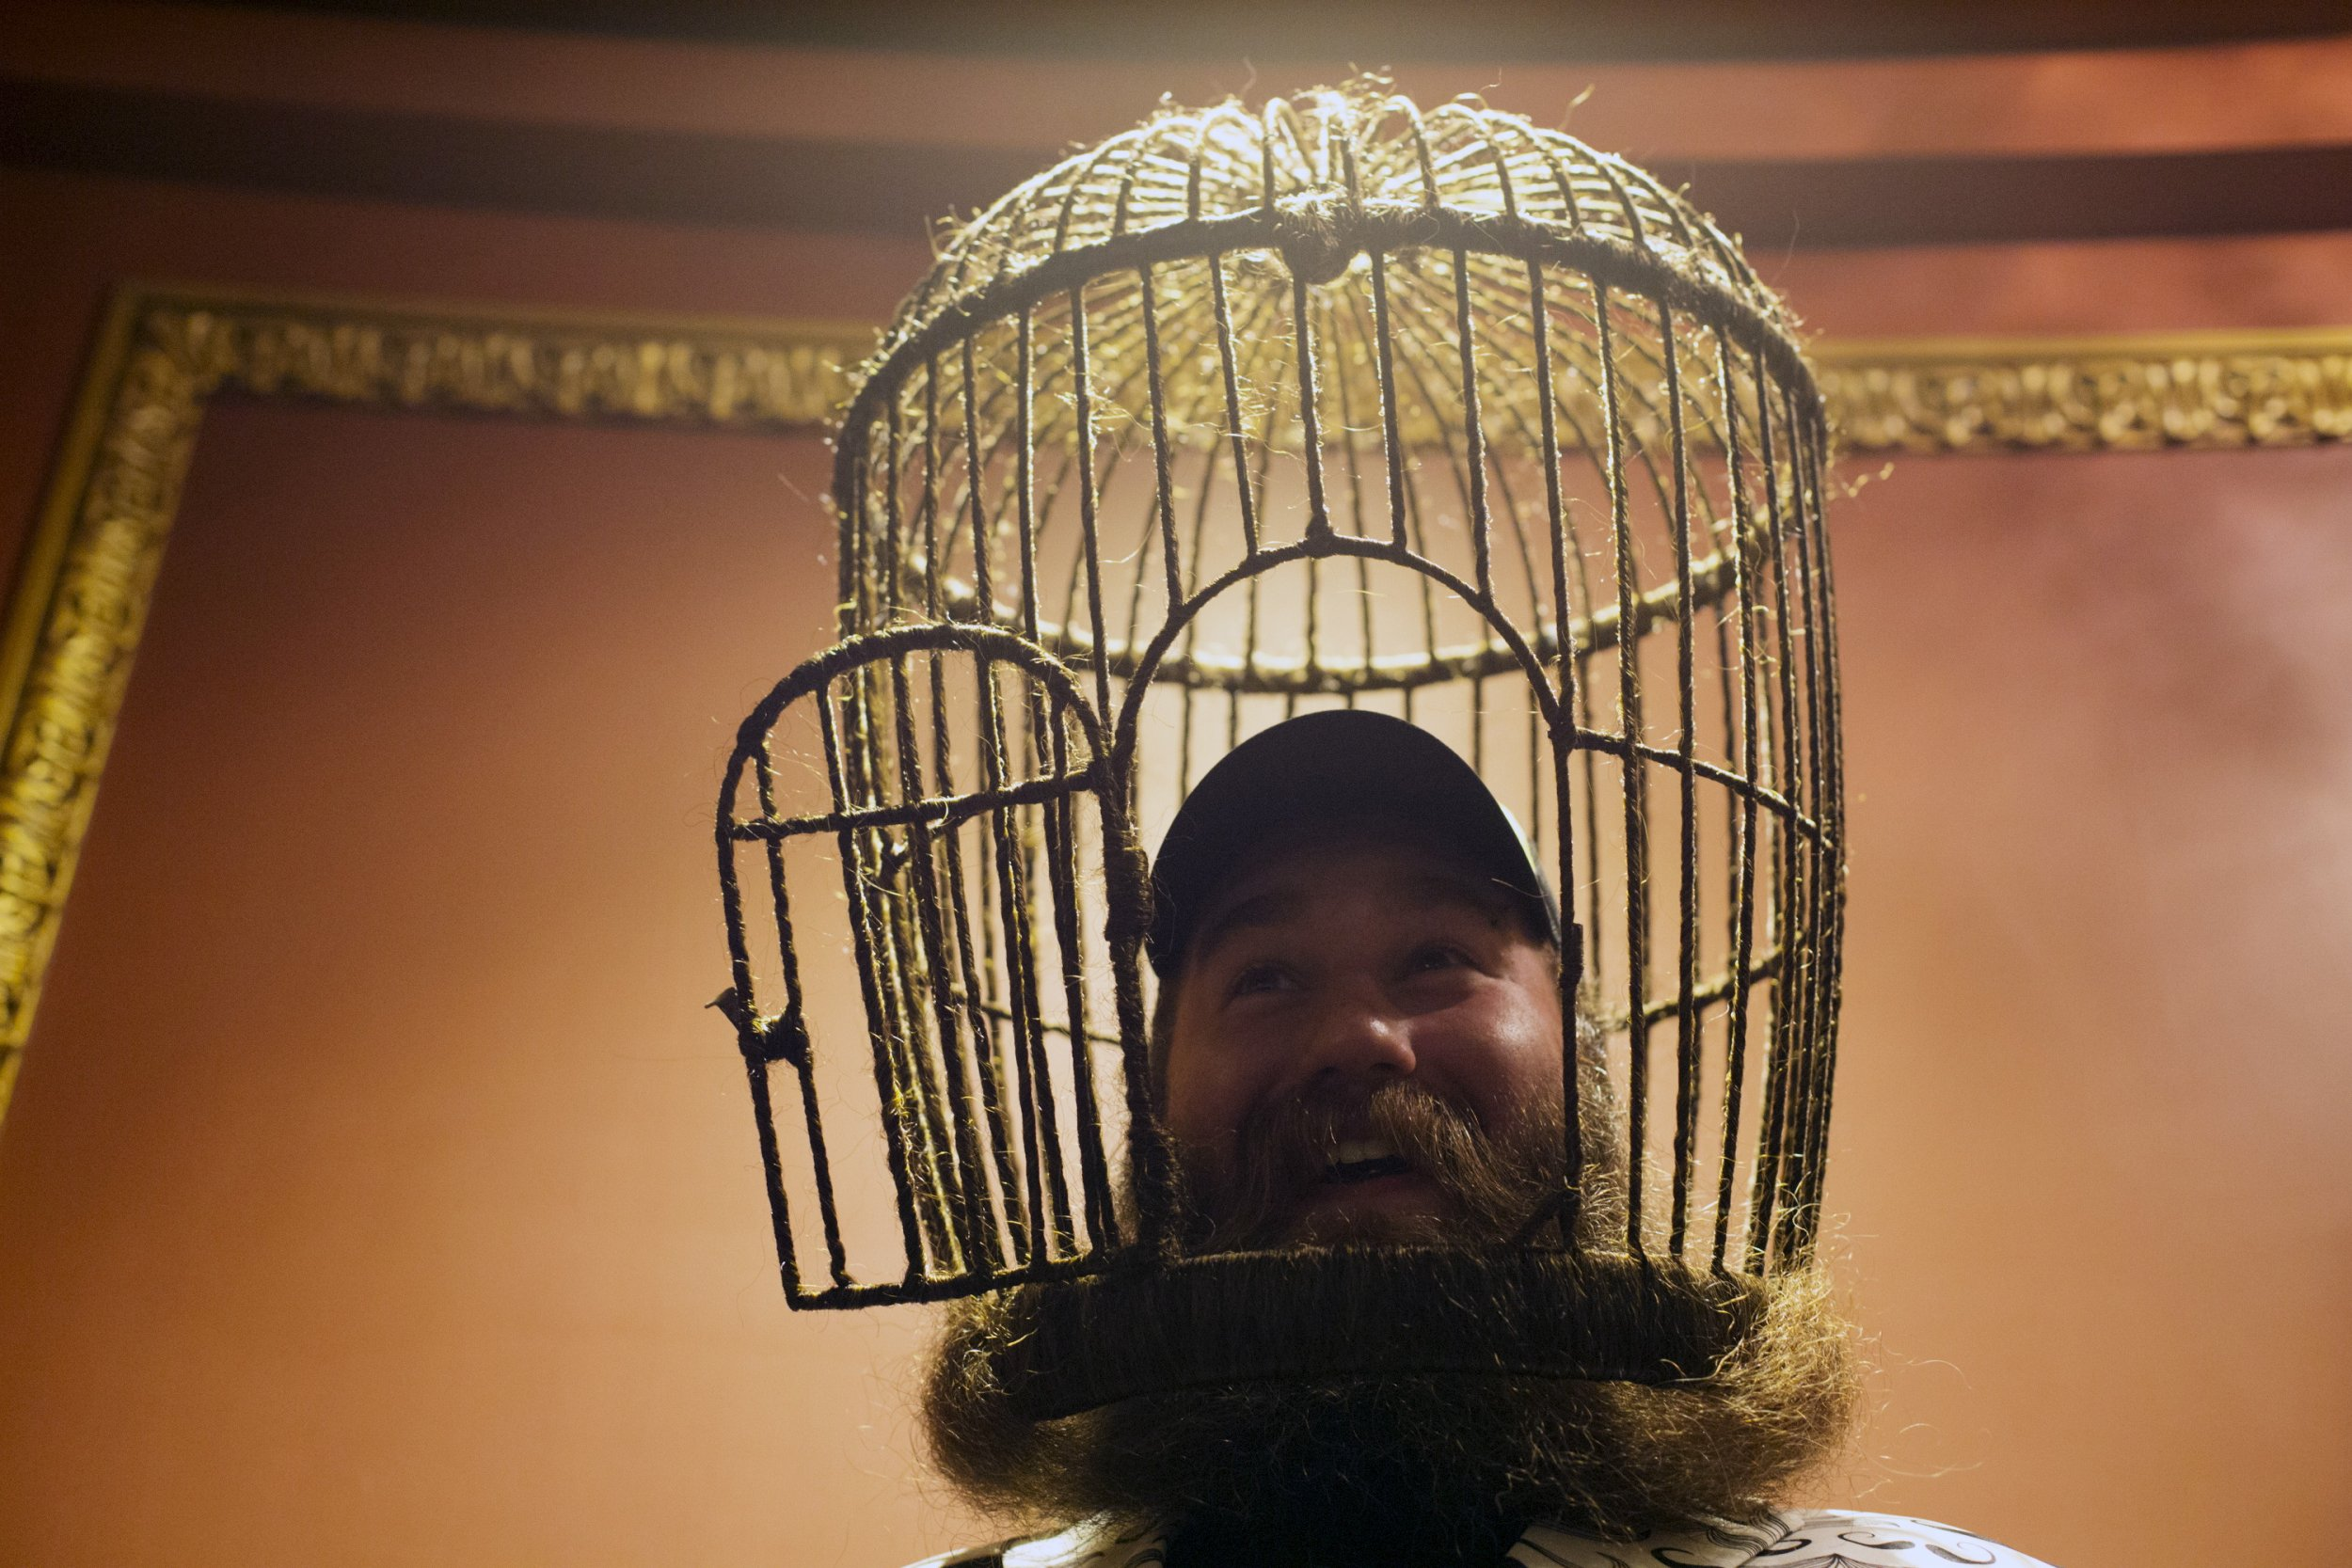 Photos Facial Hair Enthusiasts Face Off At National Beard